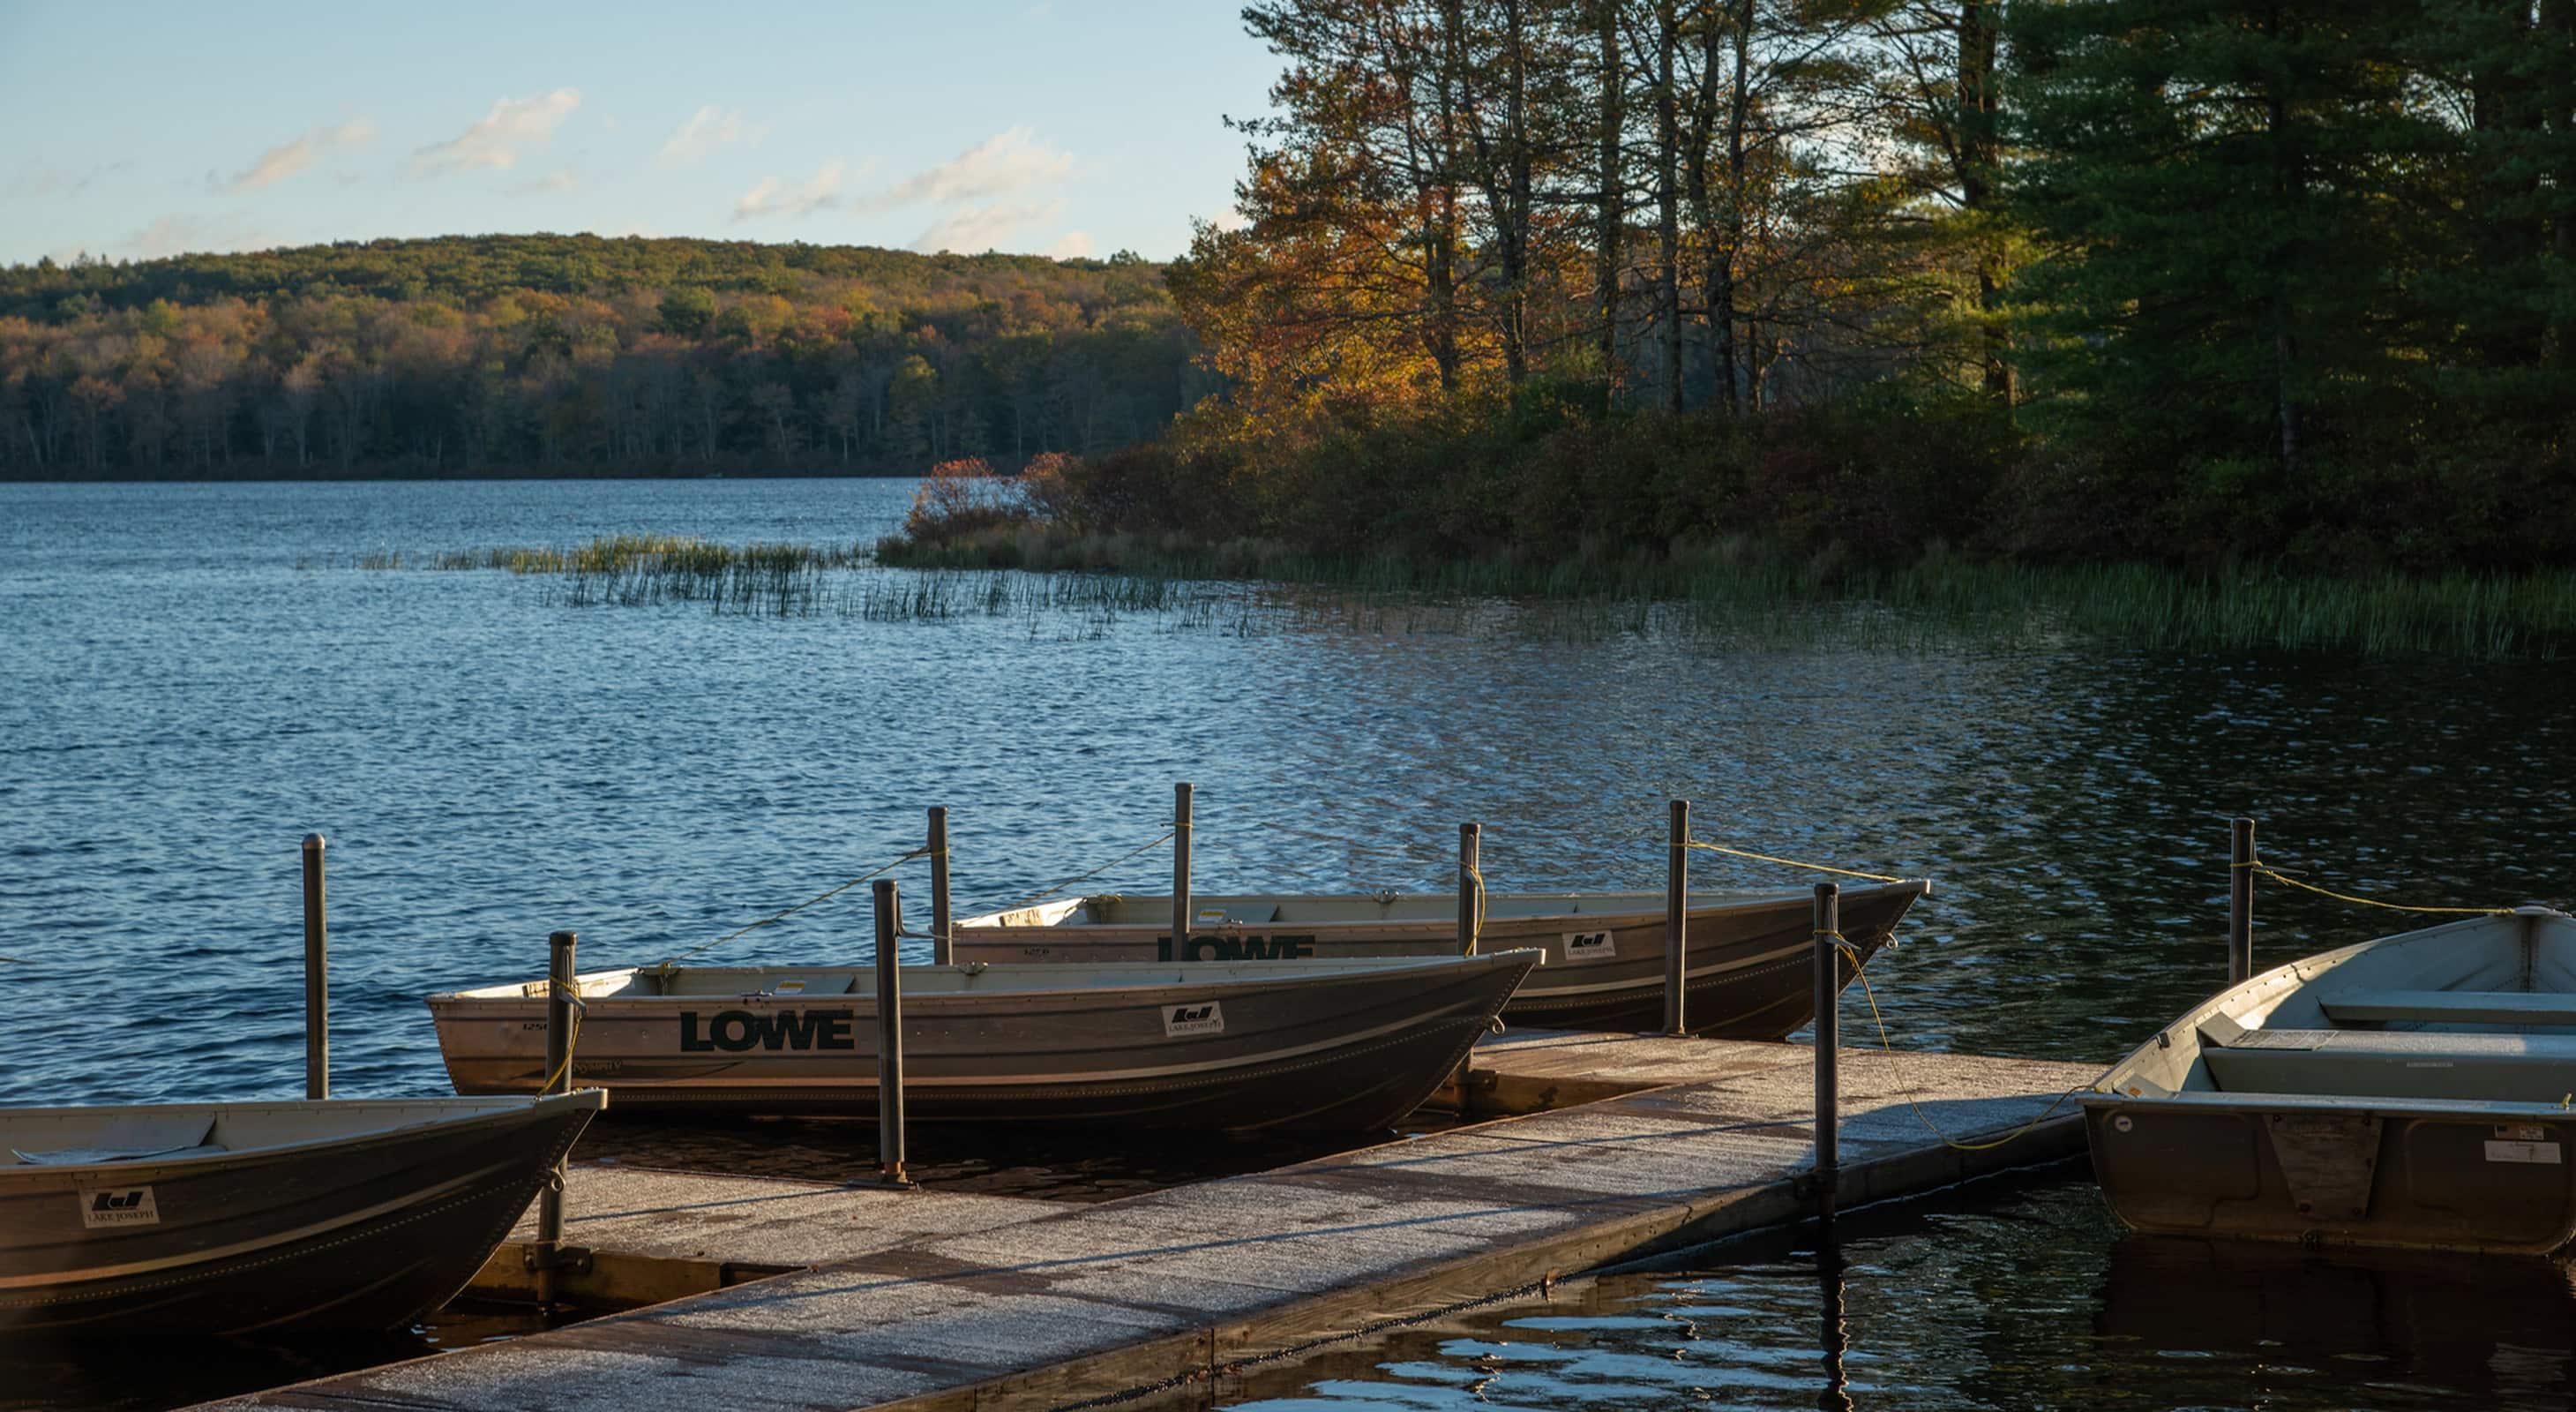 Catskills Bed and Breakfast | Romantic B&B in Upstate NY